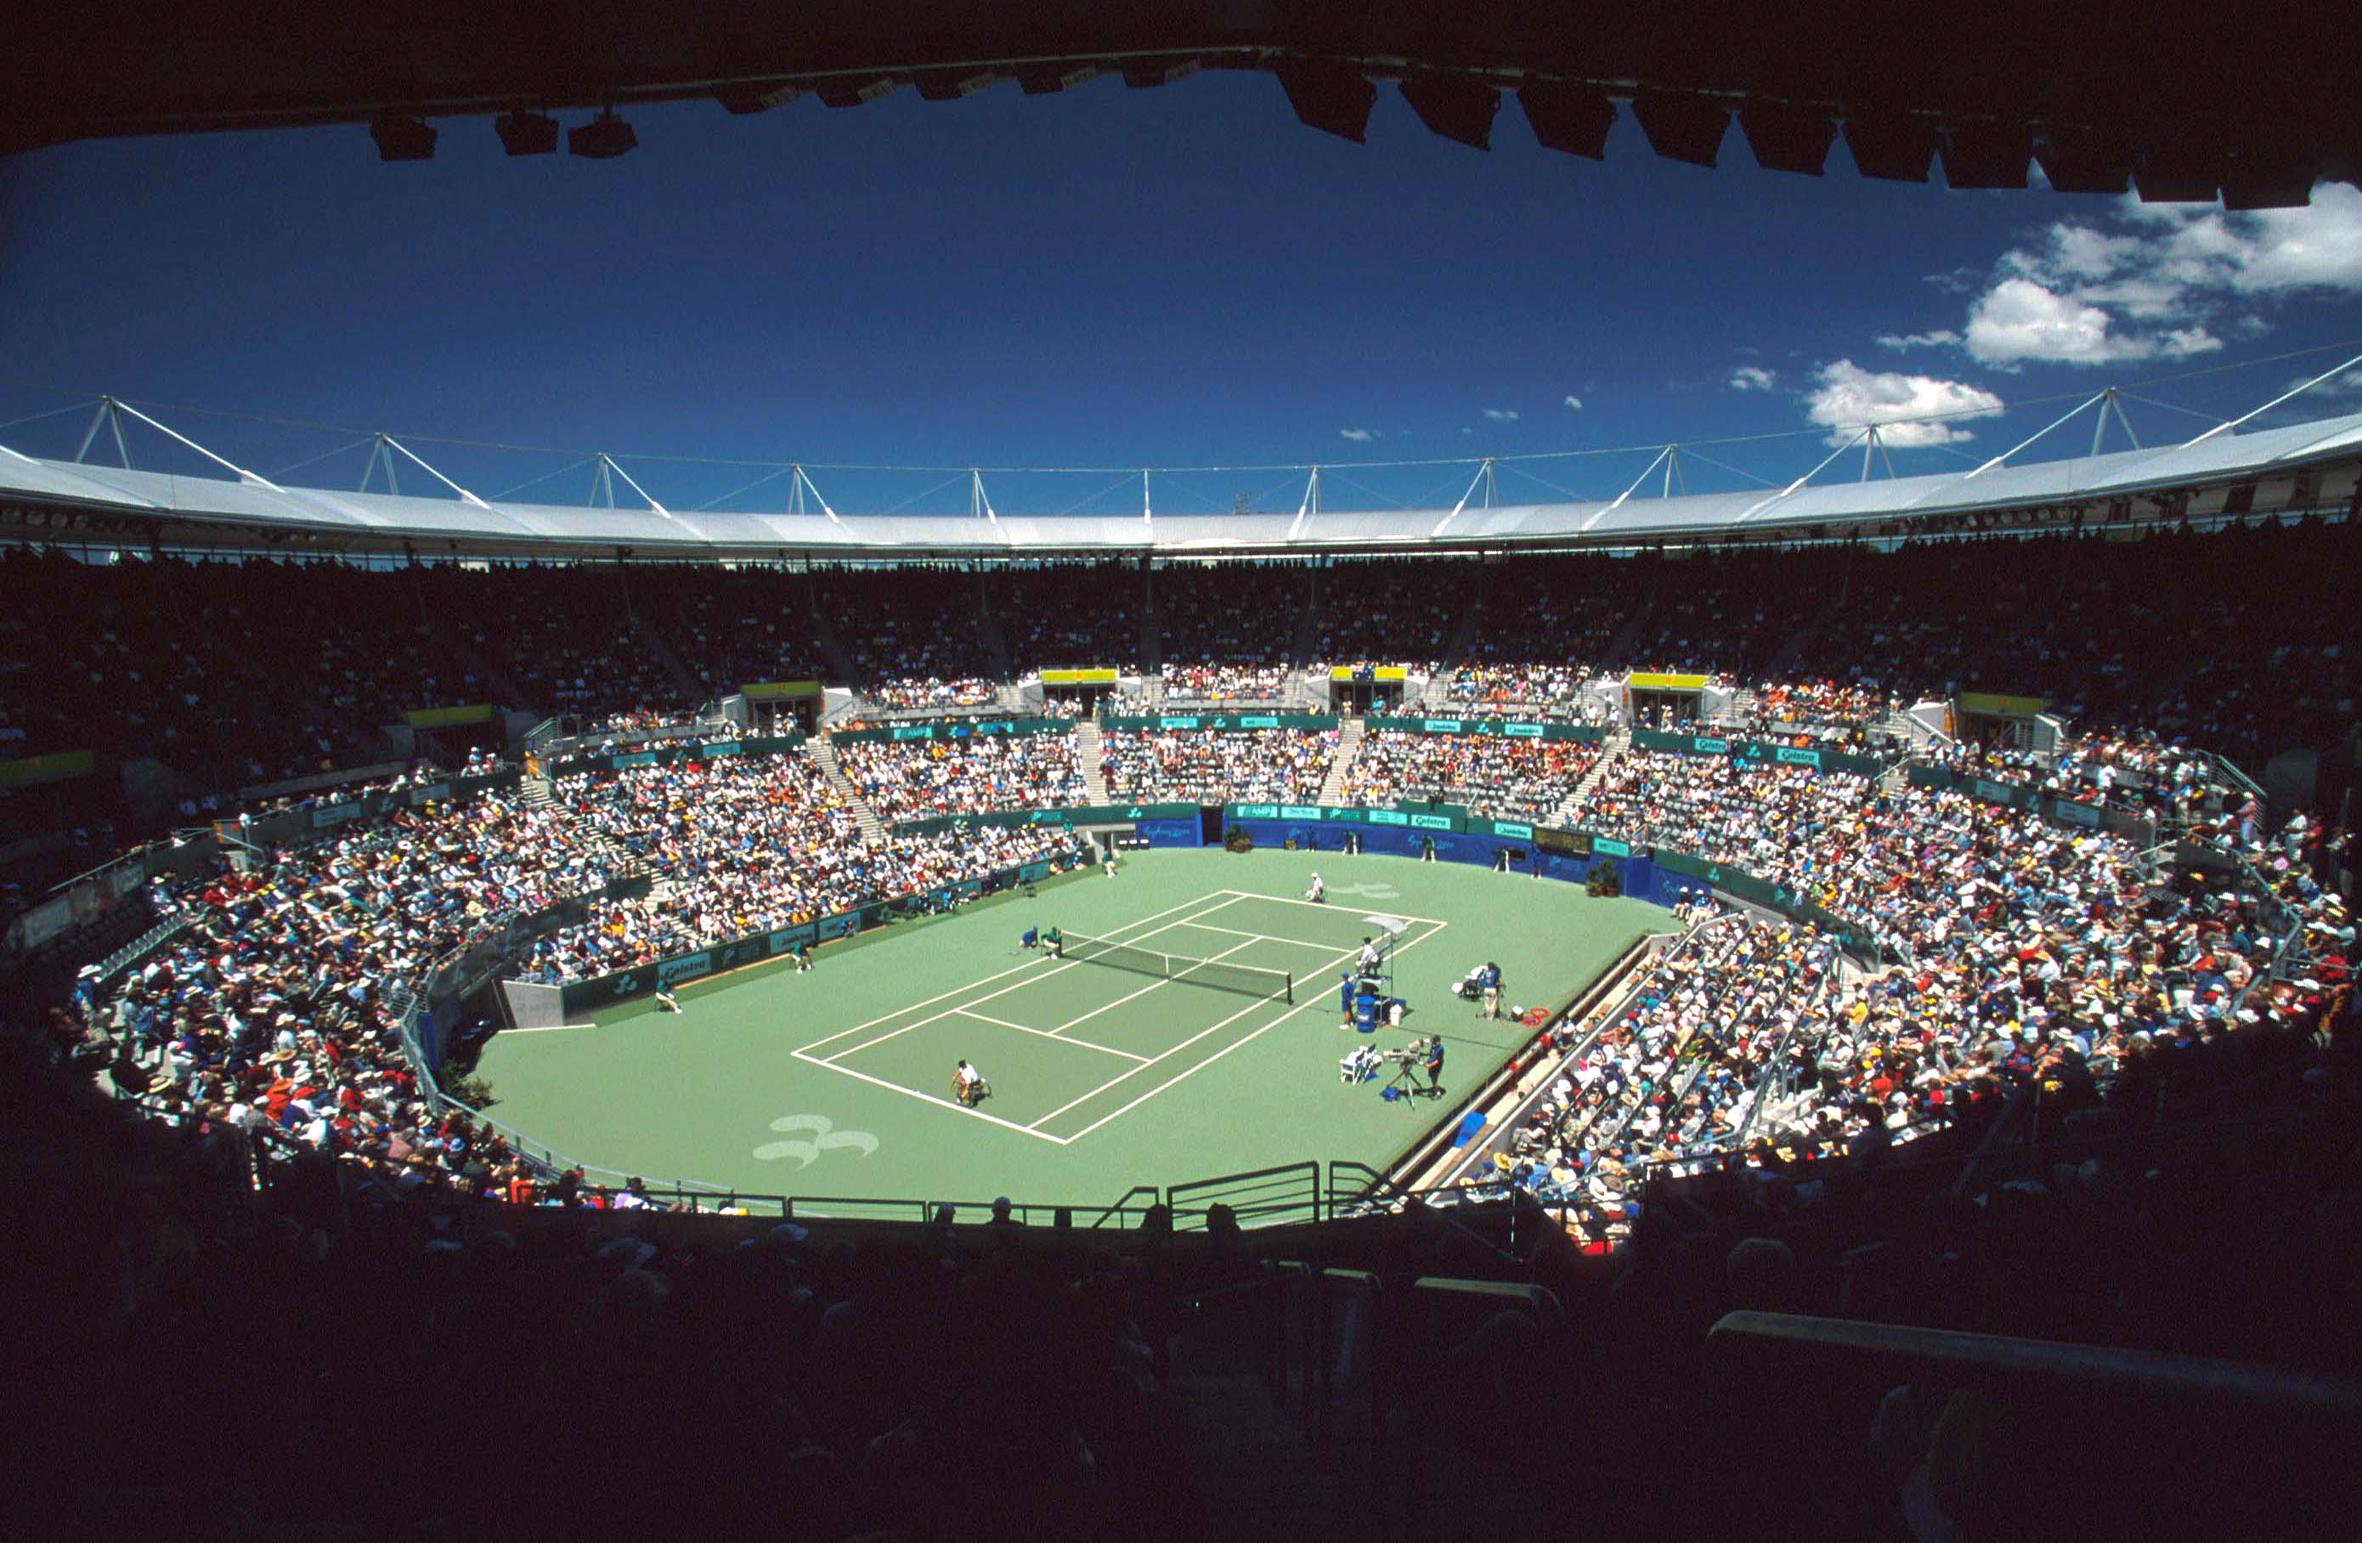 tennis sydney - photo #8